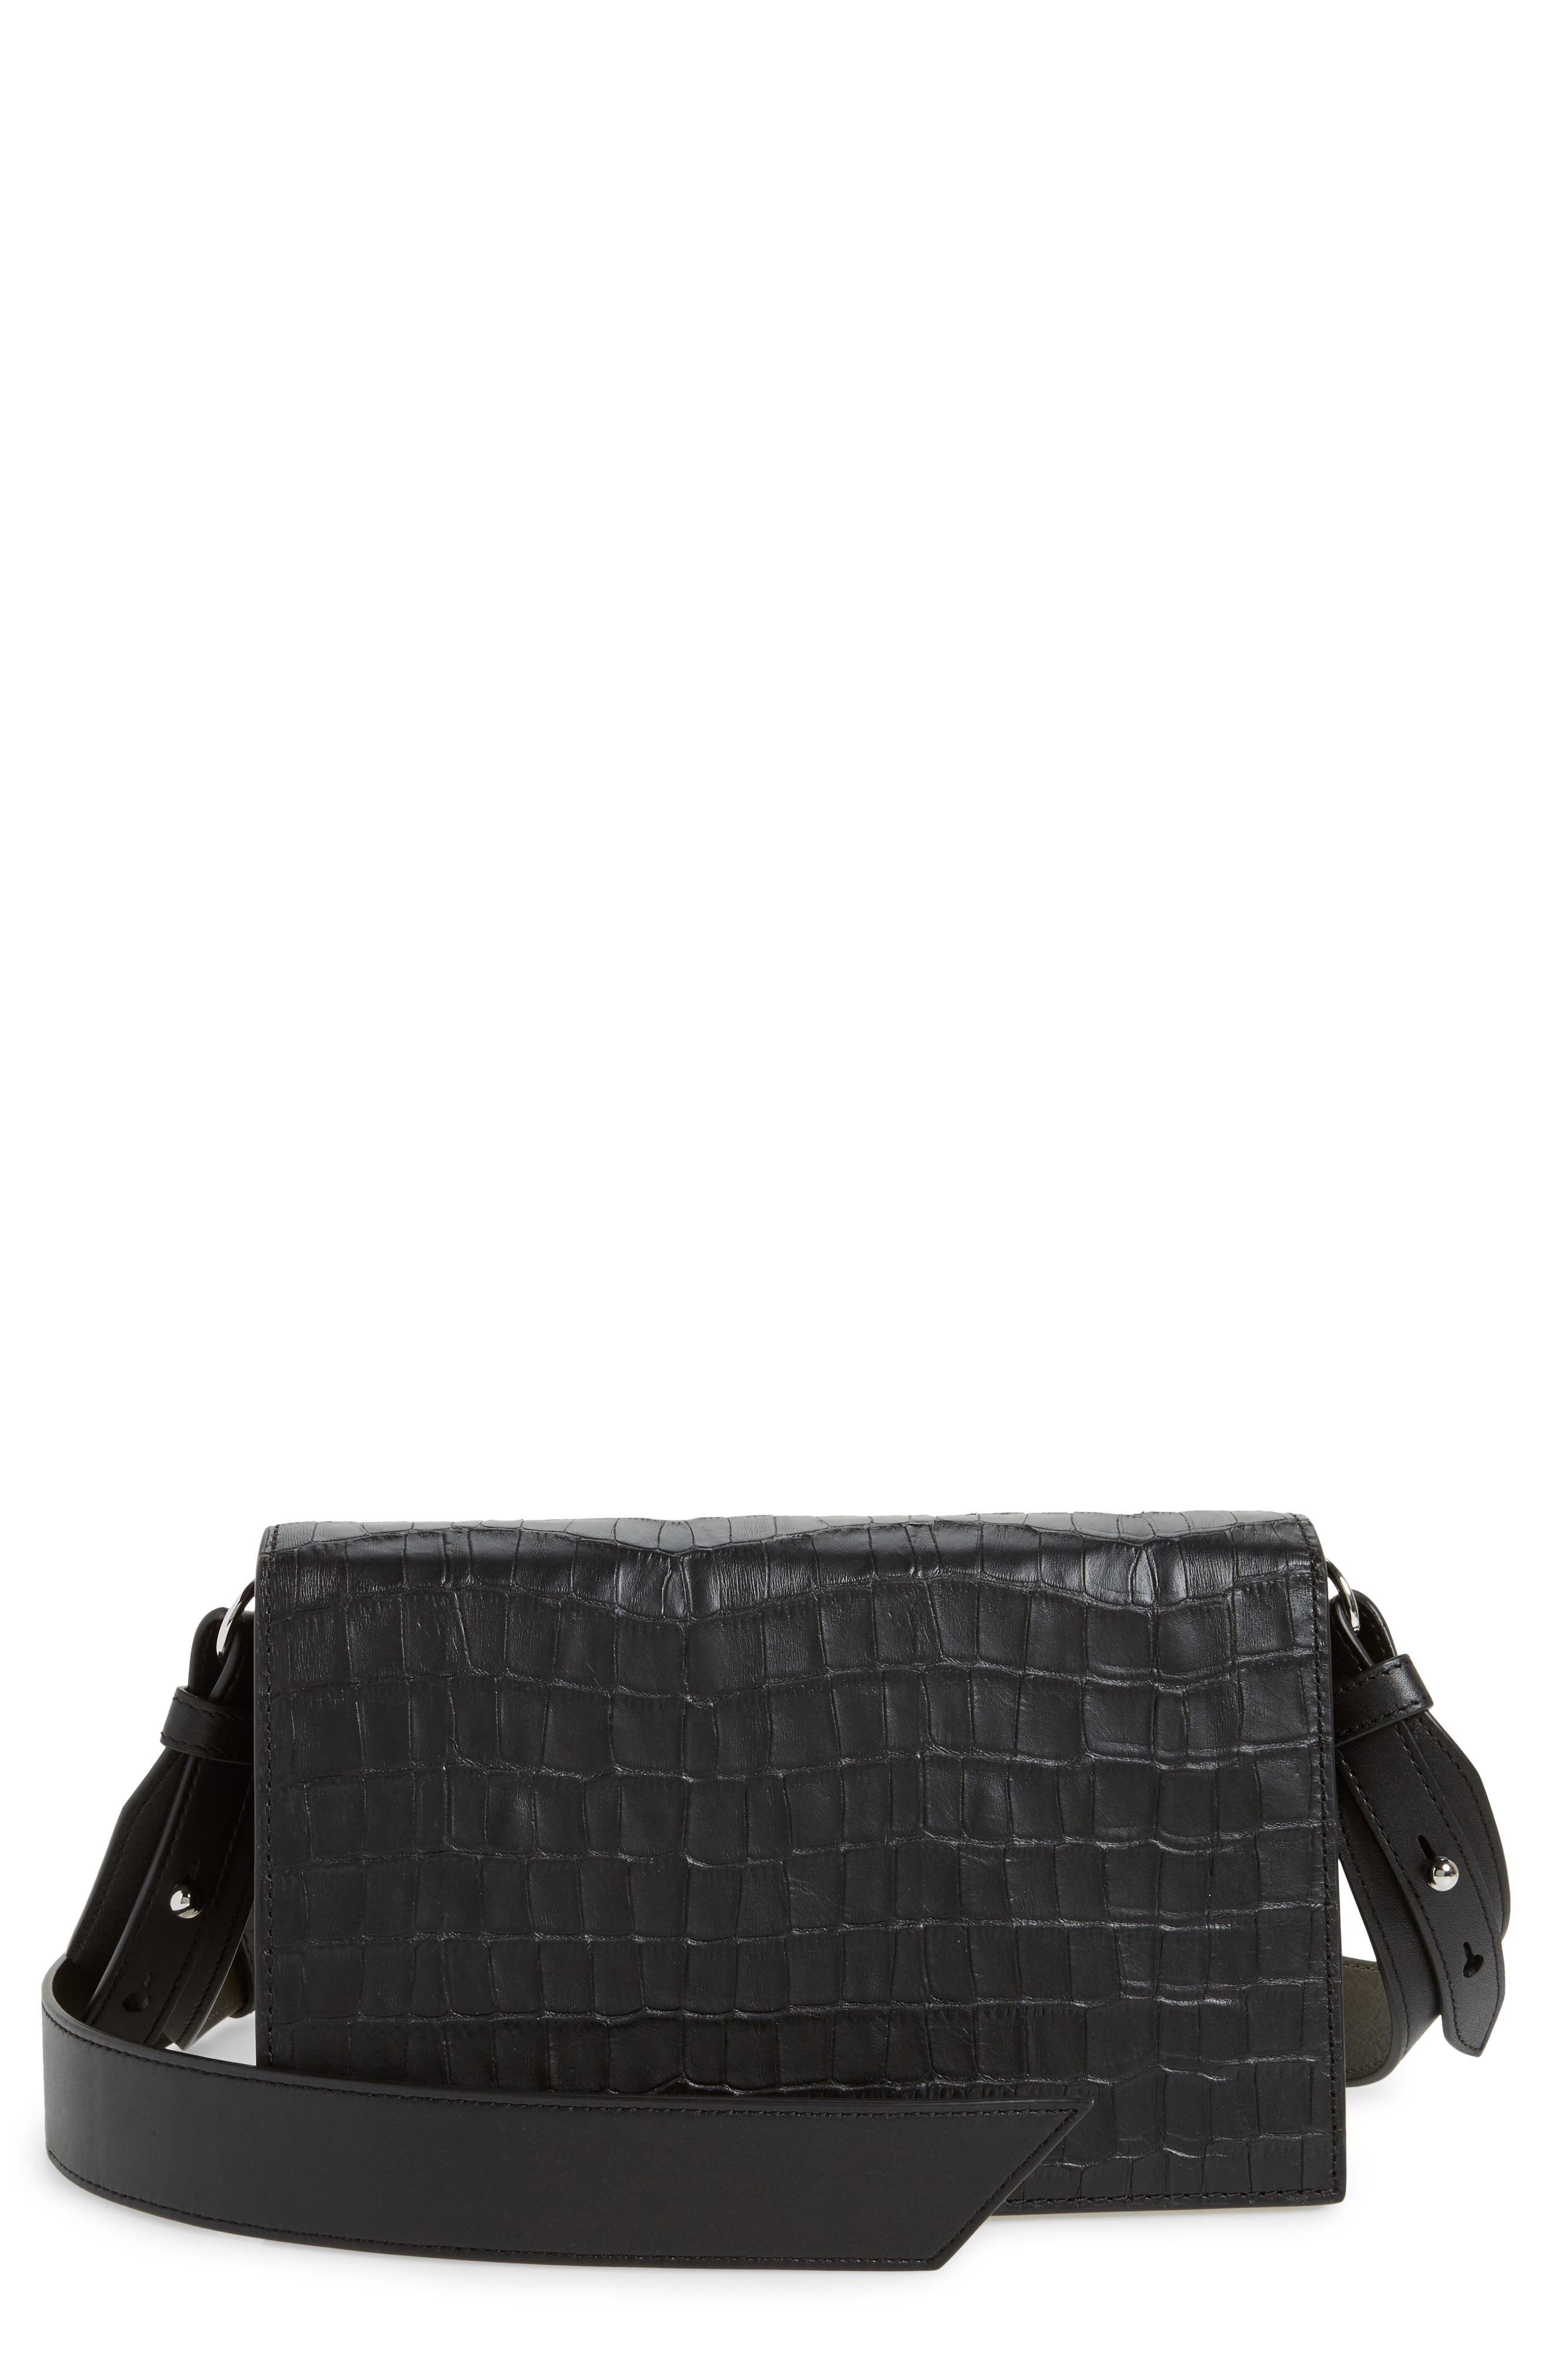 Alternate Image 1 Selected - ALLSAINTS Keel Croc Embossed Leather Box Bag